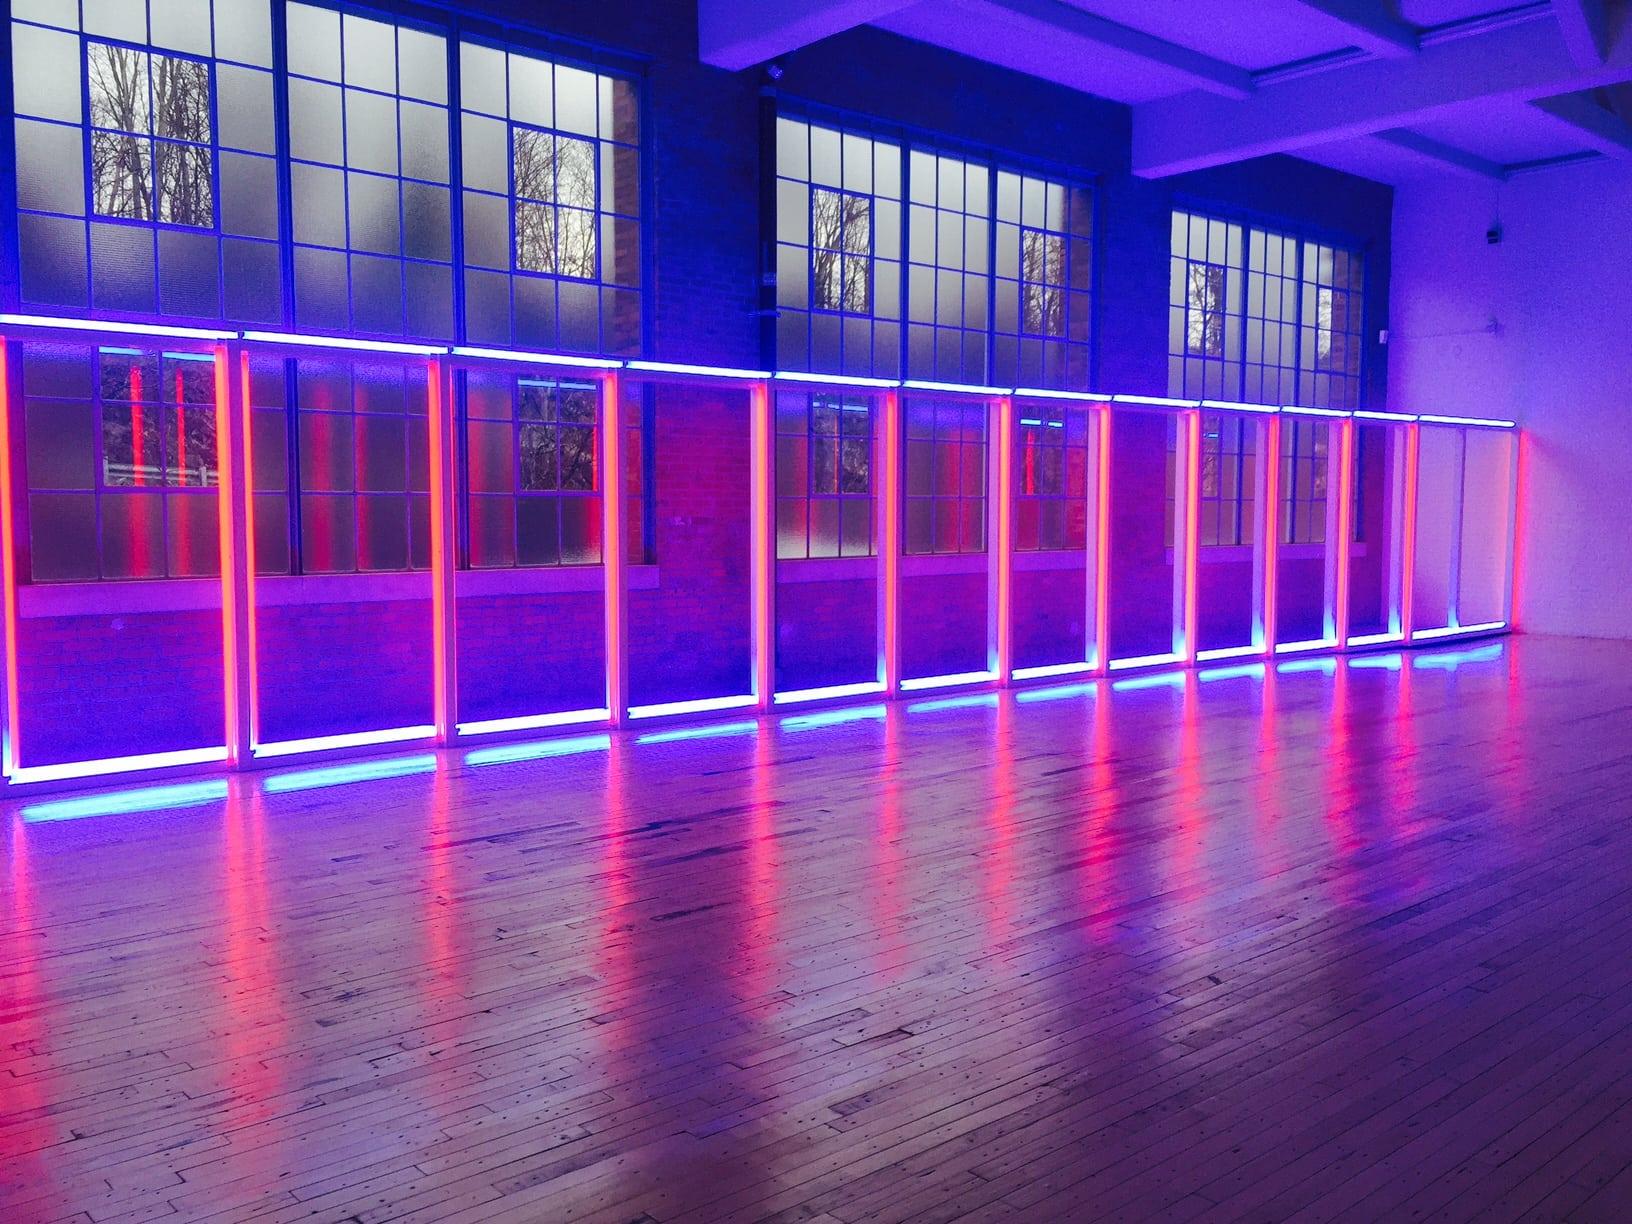 Day Trip to Beacon, NY for World Class Contemporary Art